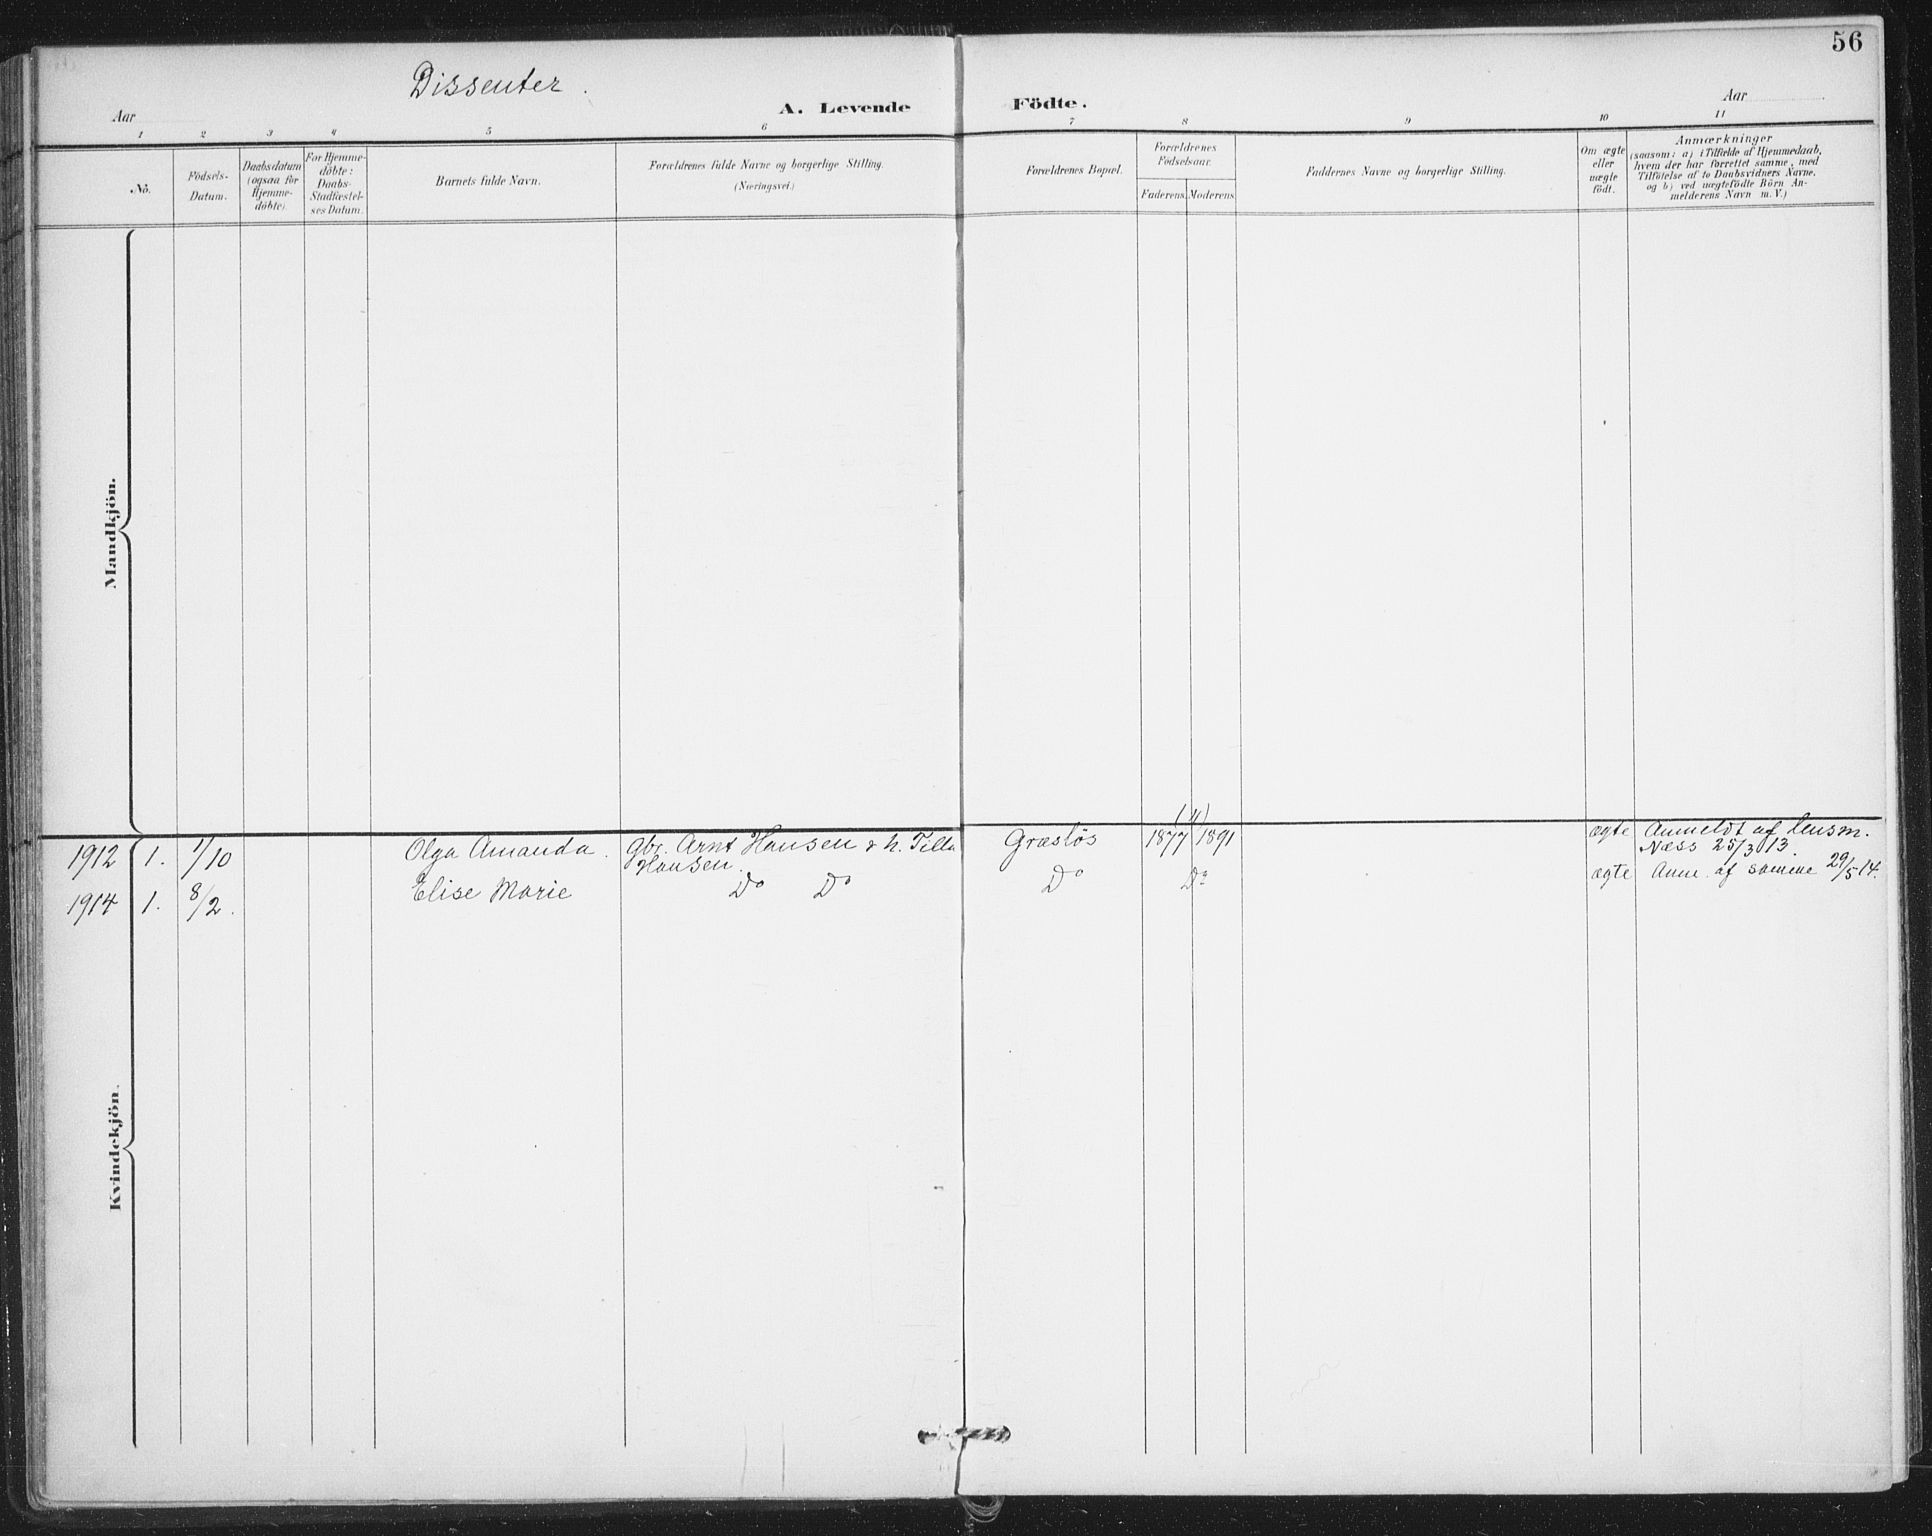 SAO, Varteig prestekontor Kirkebøker, F/Fa/L0003: Ministerialbok nr. 3, 1899-1919, s. 56